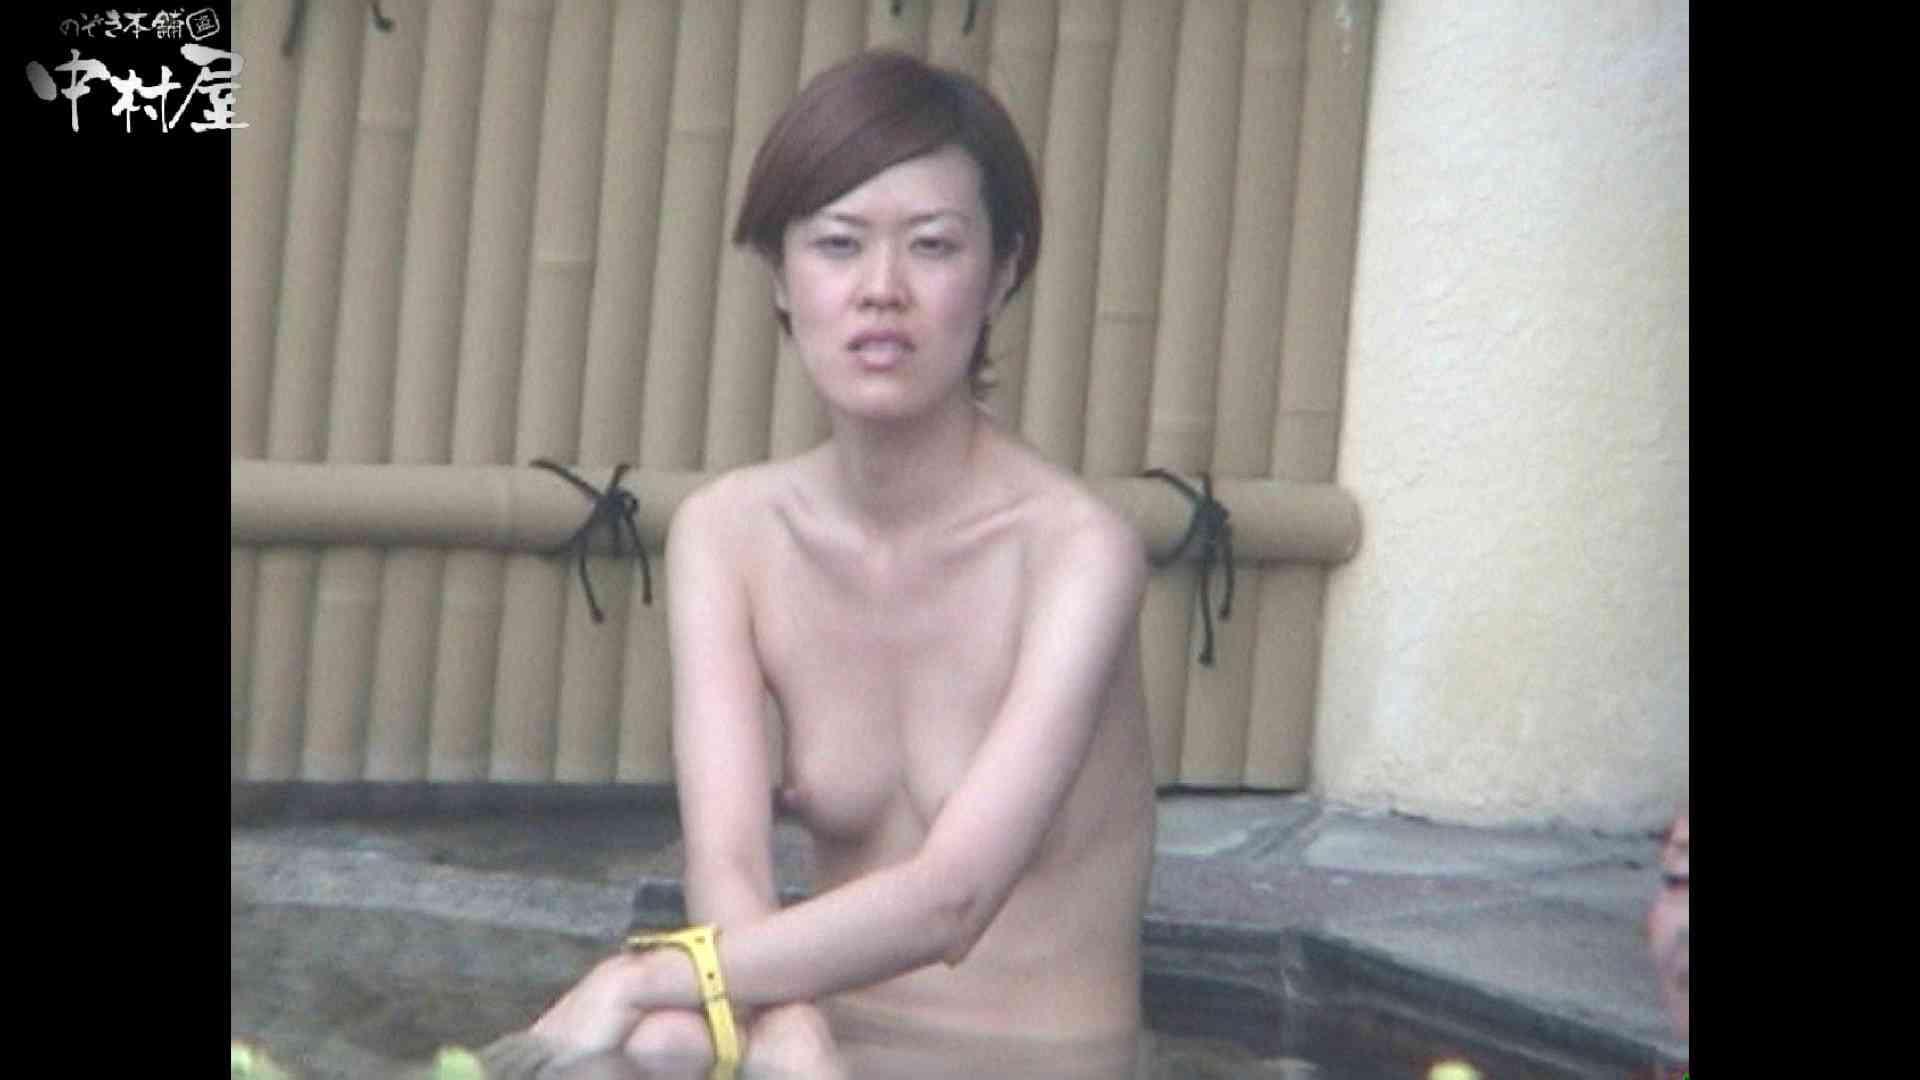 Aquaな露天風呂Vol.961 OL女体  65連発 42